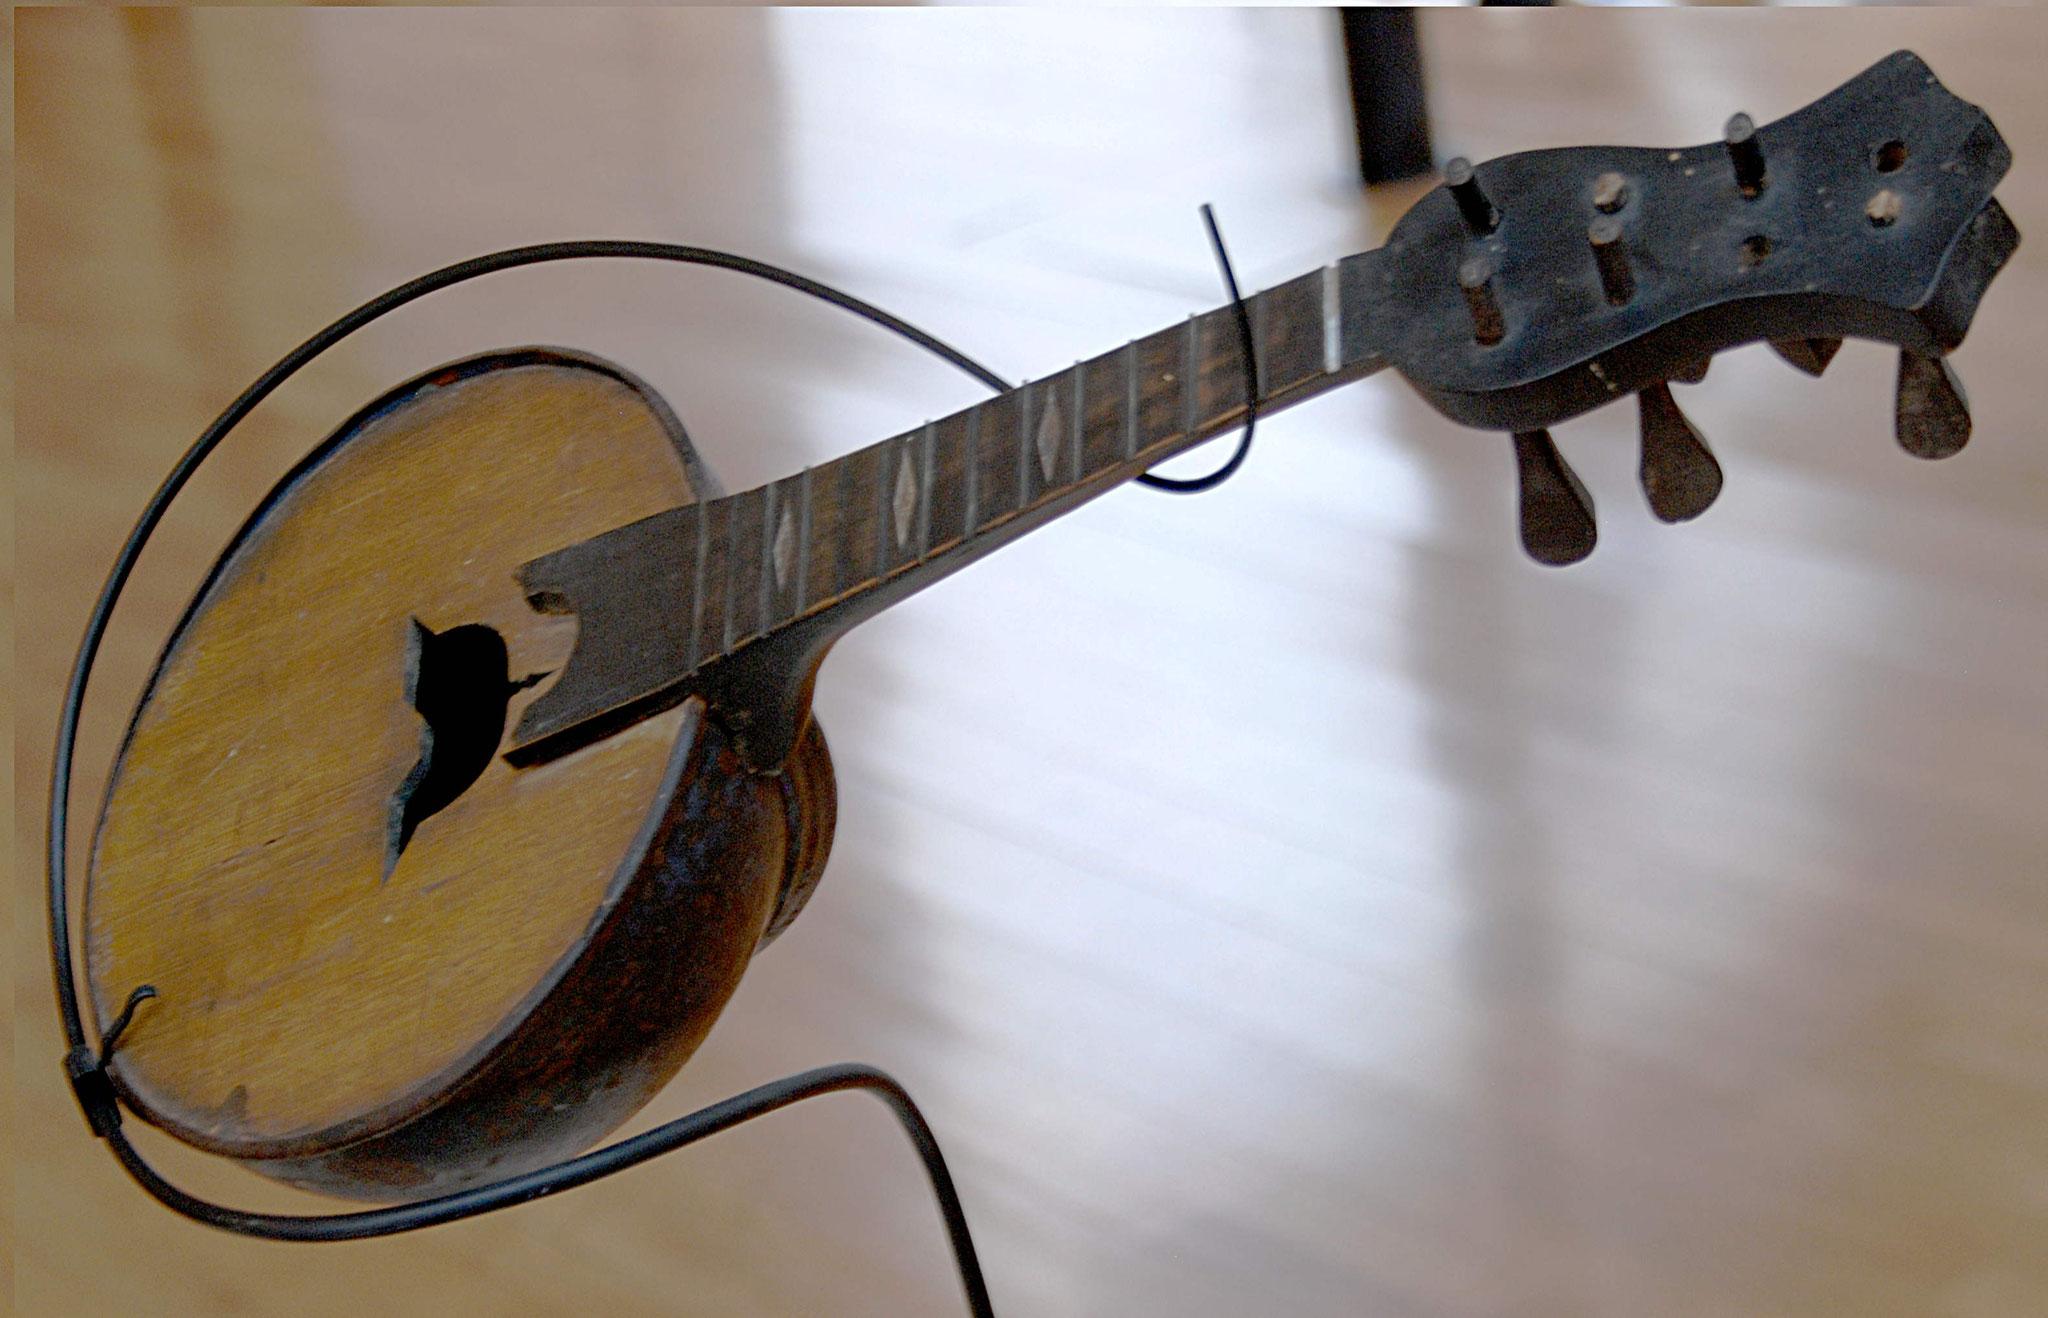 La mandoline artisanale allemande